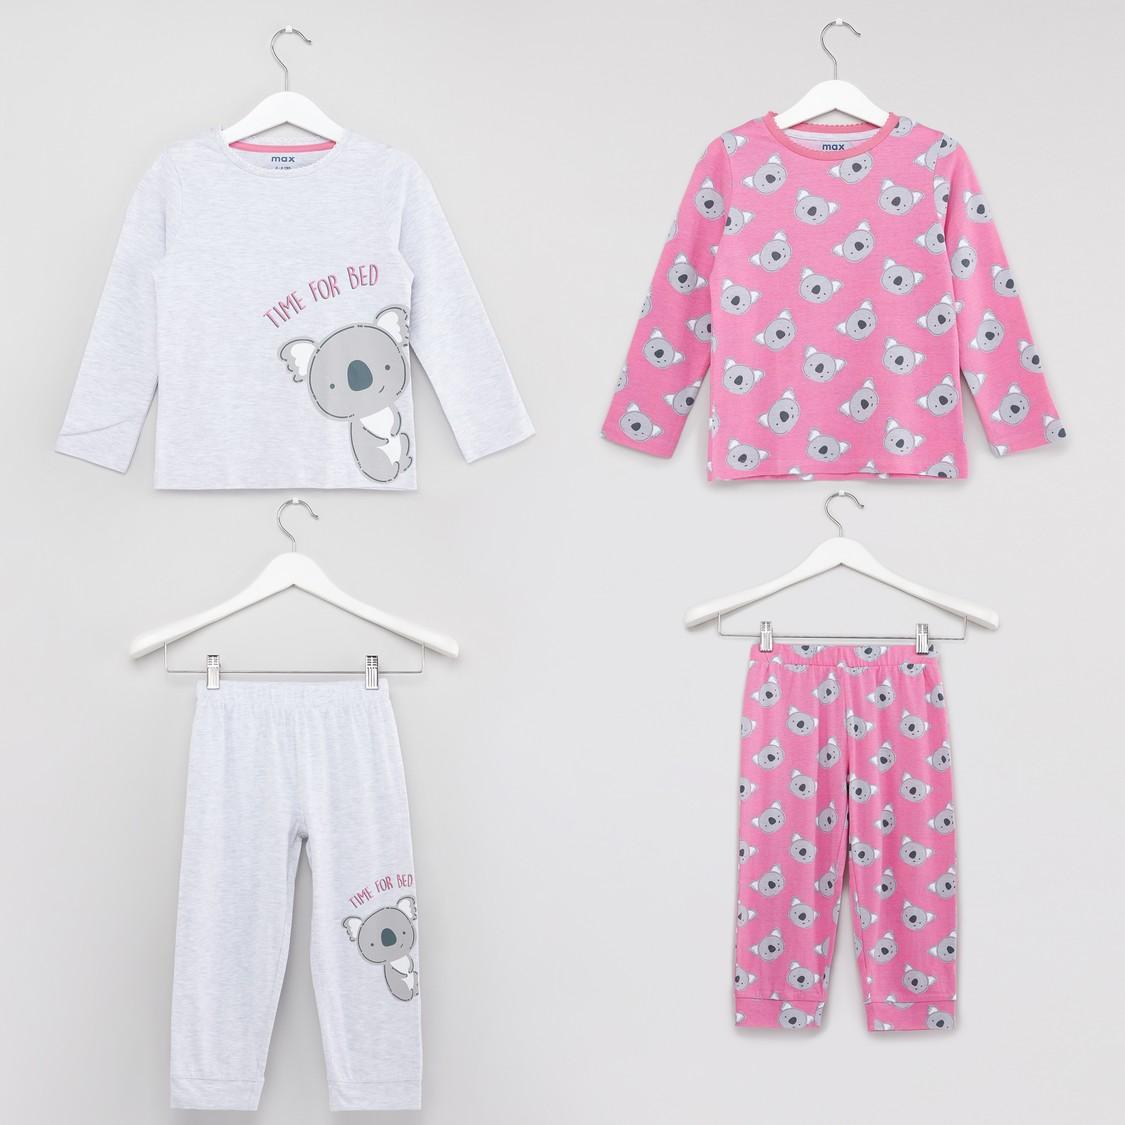 Set of 2 - Printed Round Neck T-shirt and Full Length Jog Pants